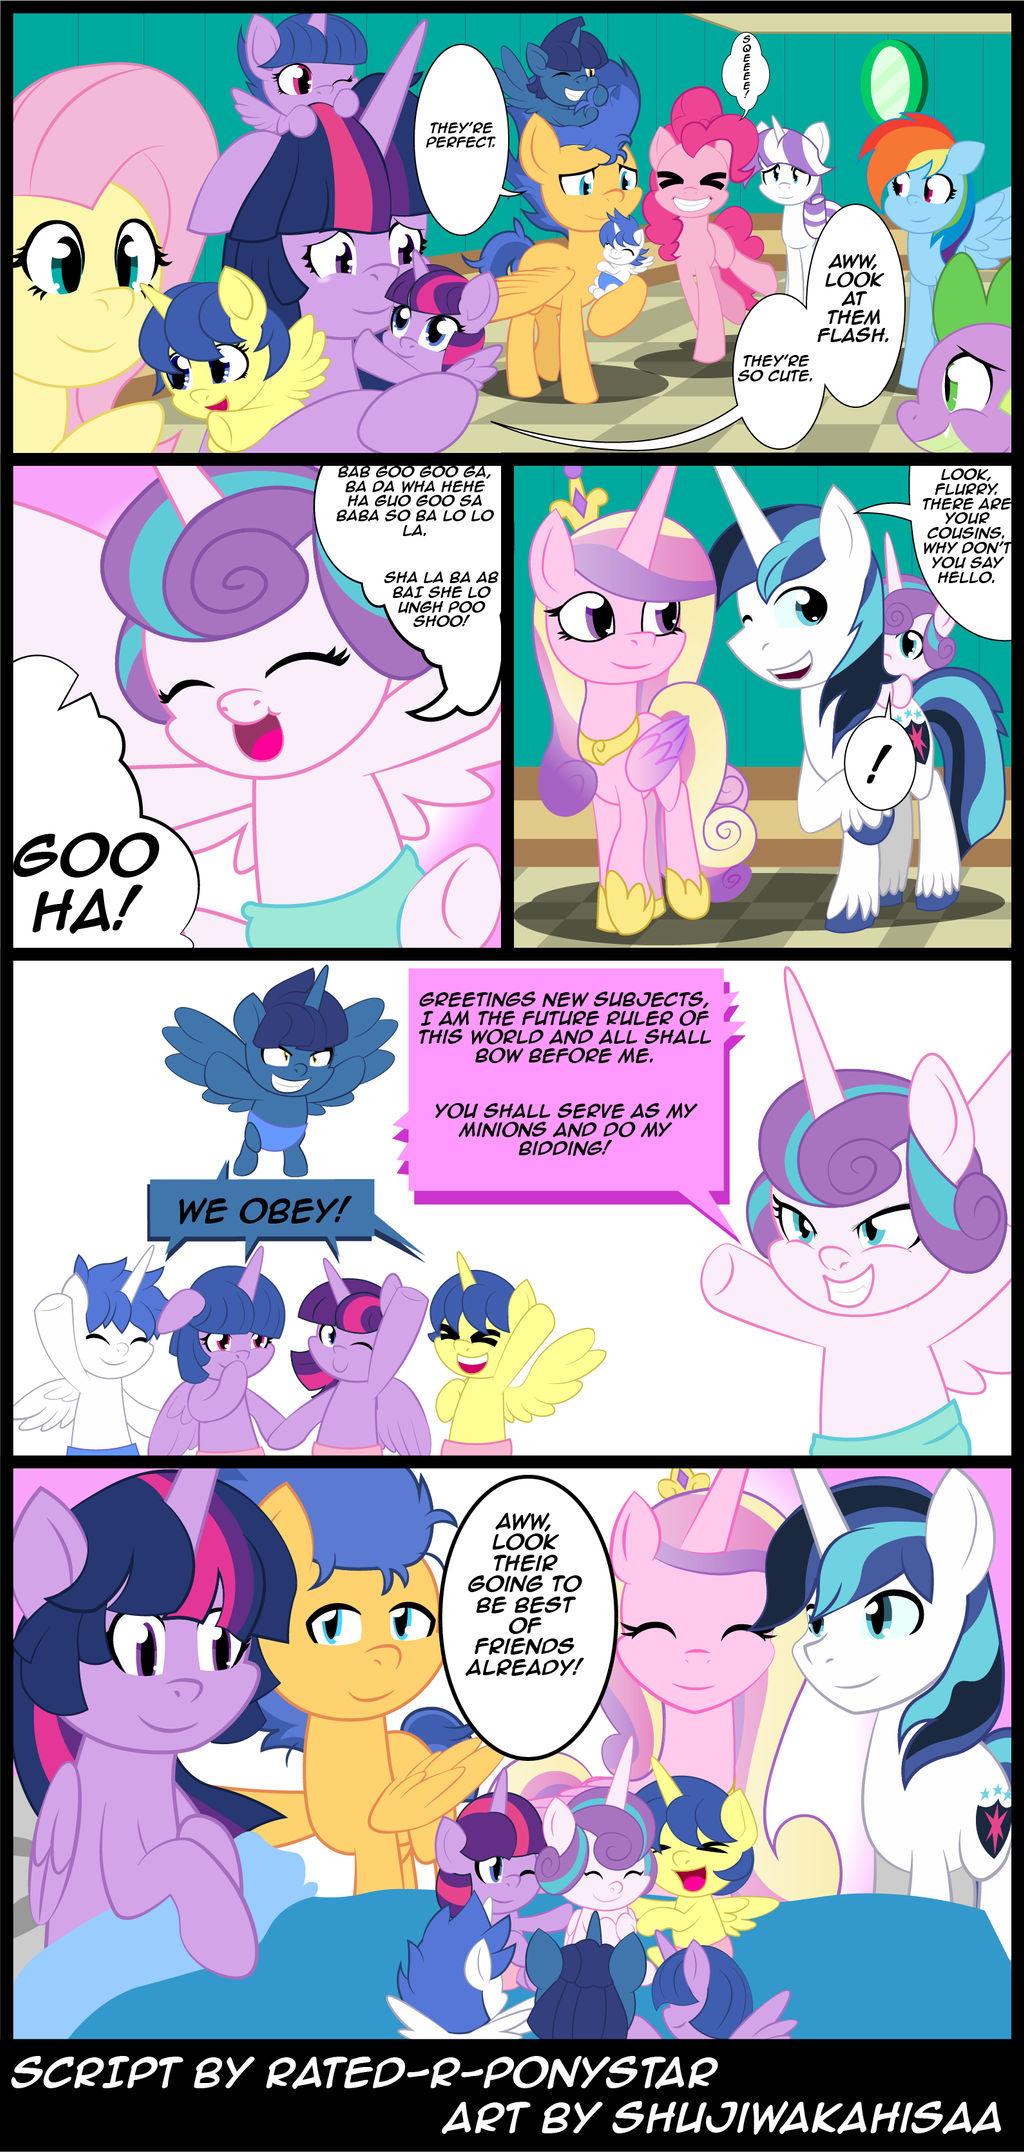 Aww RD is cutest pony t